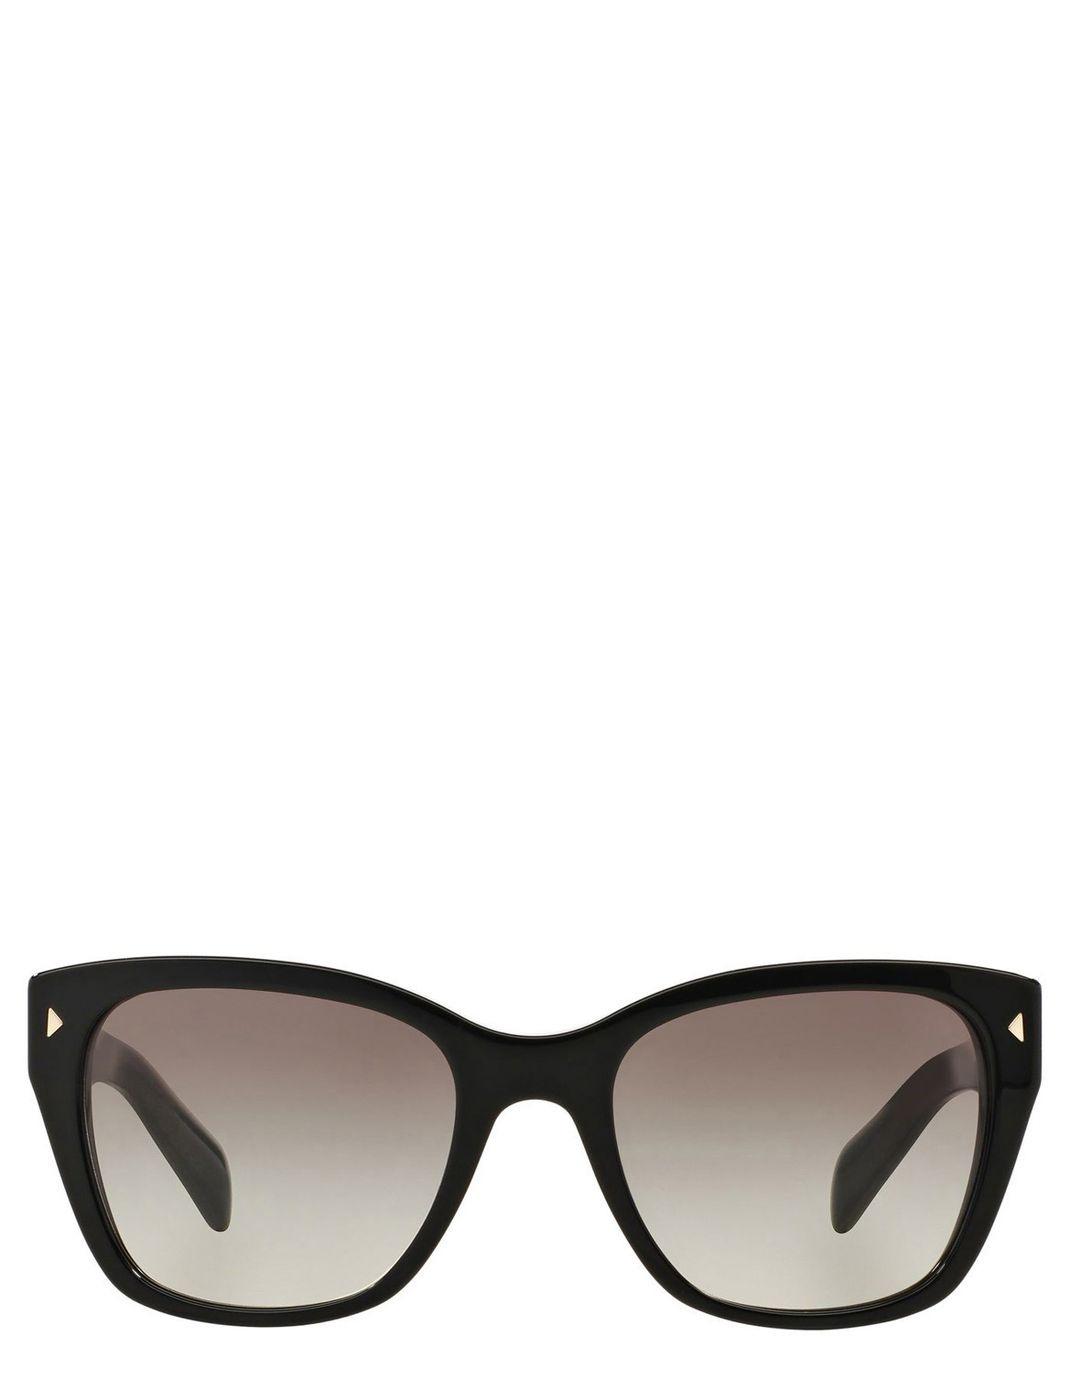 453c6b6544a1 ... order prada pr 09ss sunglasses myer online c09fe a5762